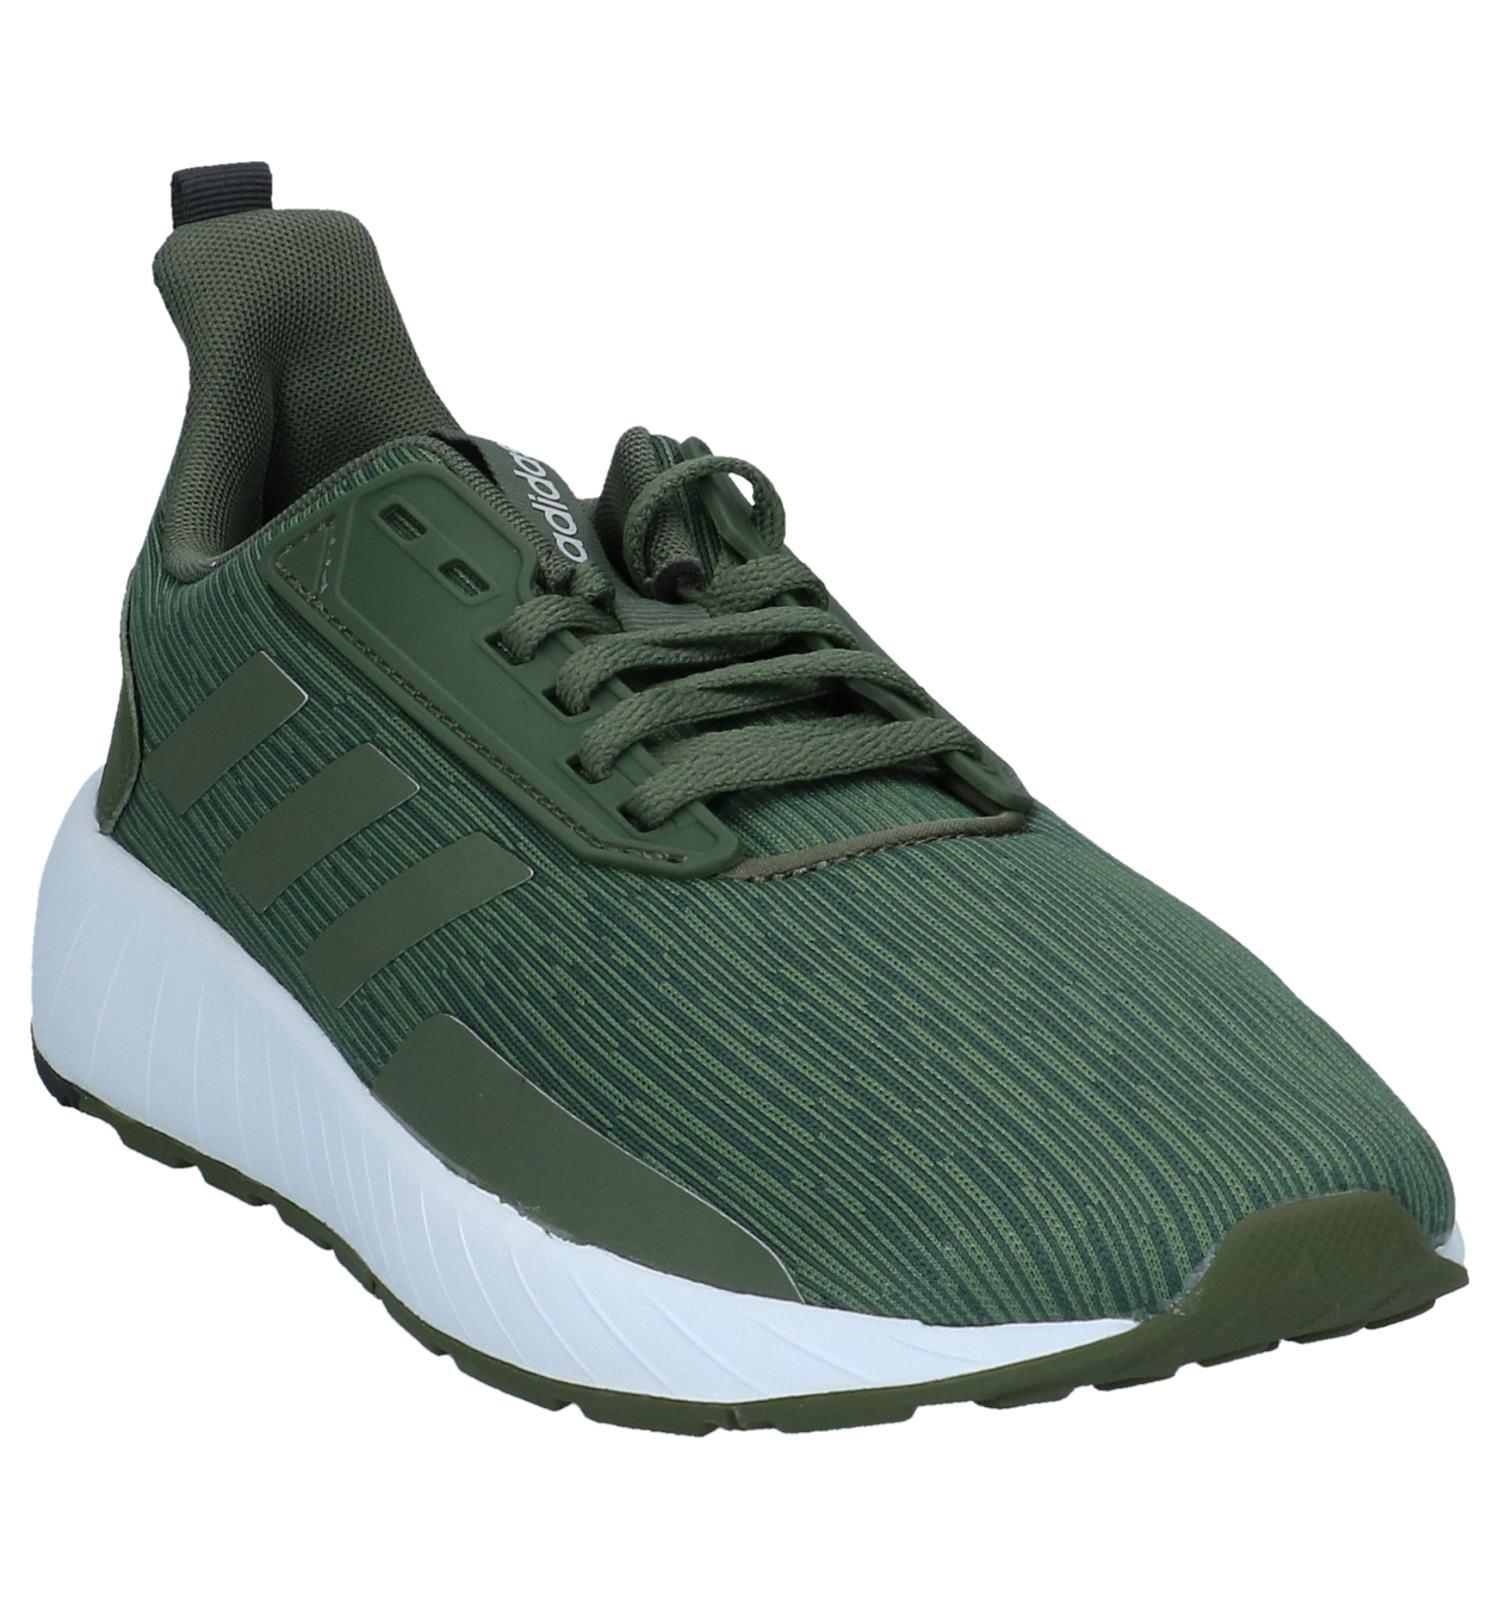 adidas Questar Drive Groene Sneakers   TORFS.BE   Gratis verzend en retour